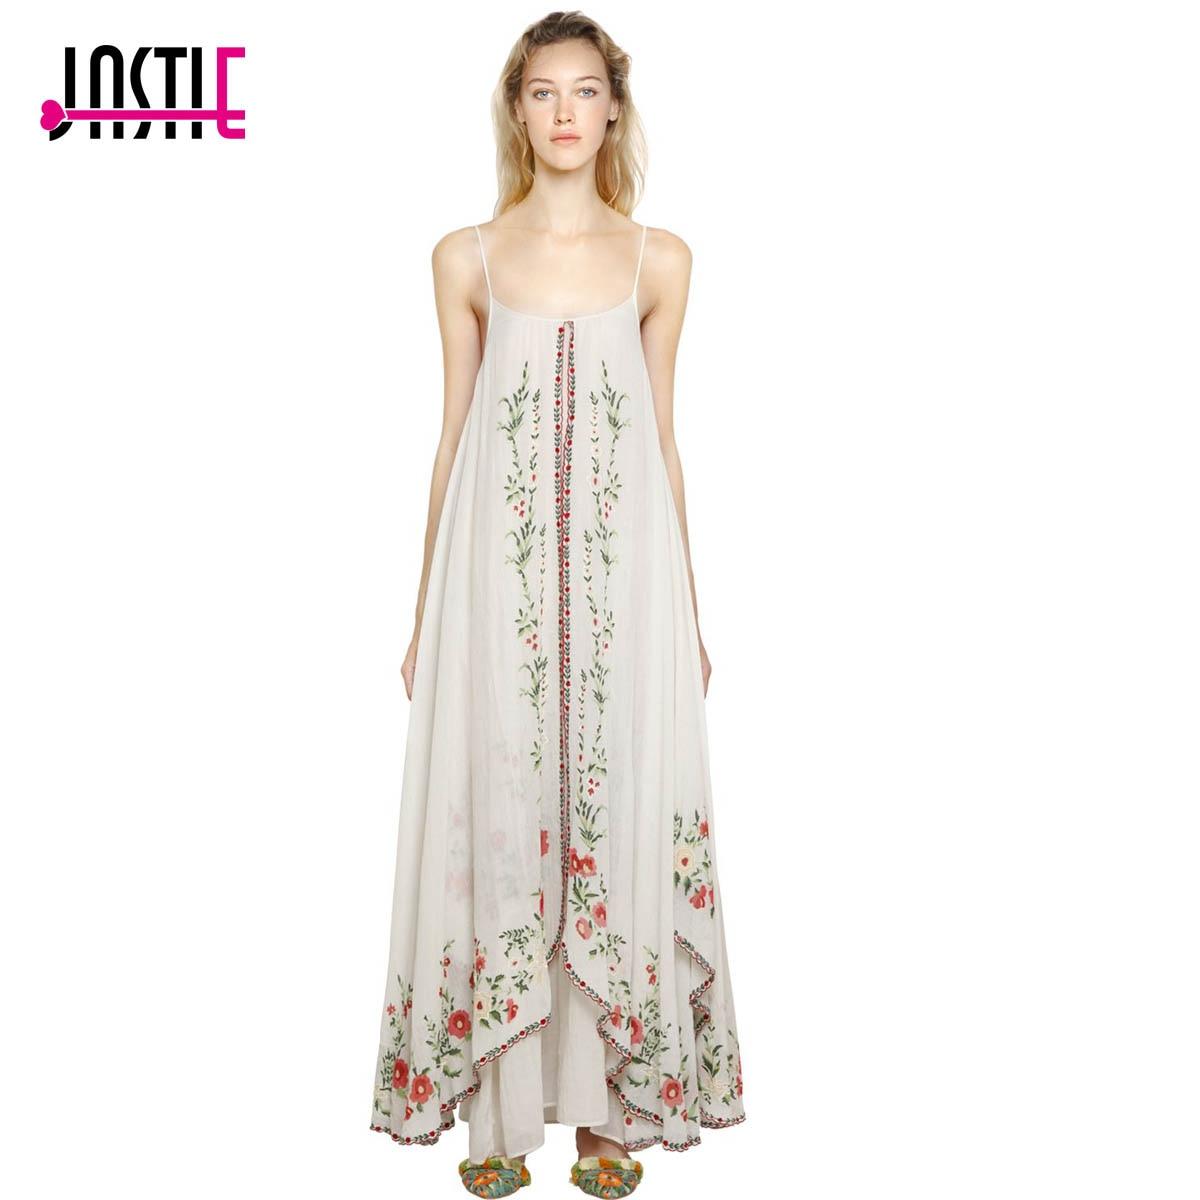 Jaatie Adjustable Straps Summer Dresses Floral Embroidered Maxi Dress Ruffle Hem Boho Dress Female Vestidos 2017